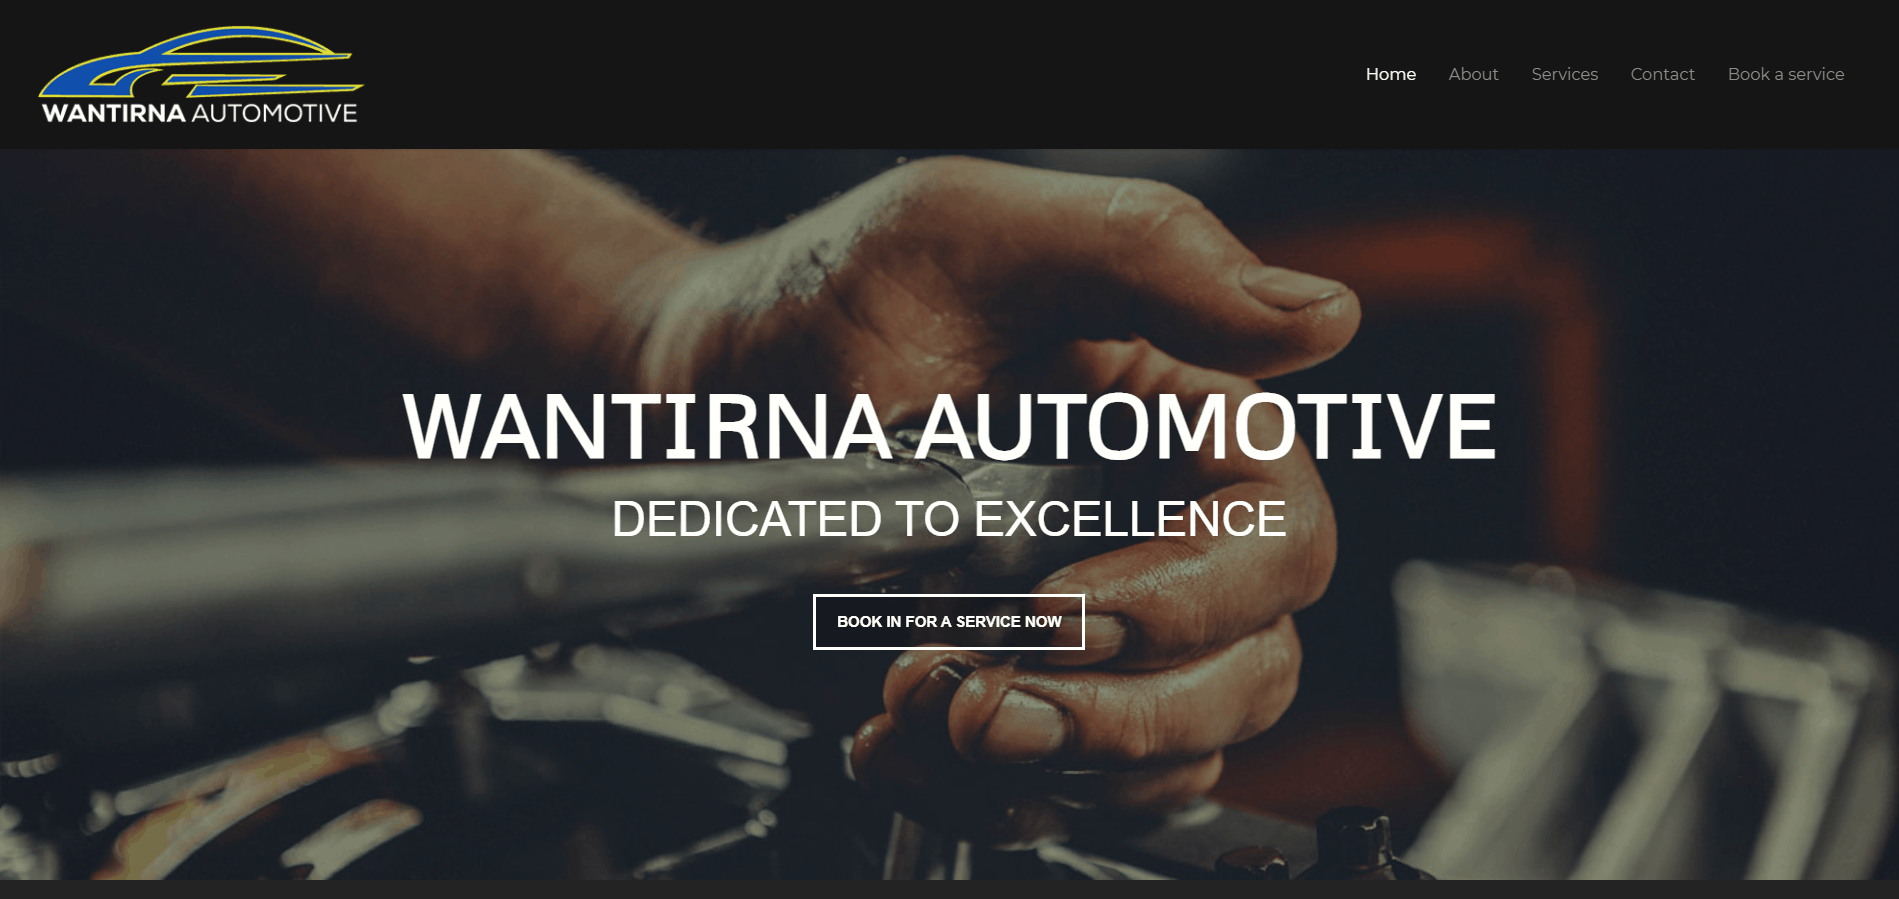 Wantirna Automotive